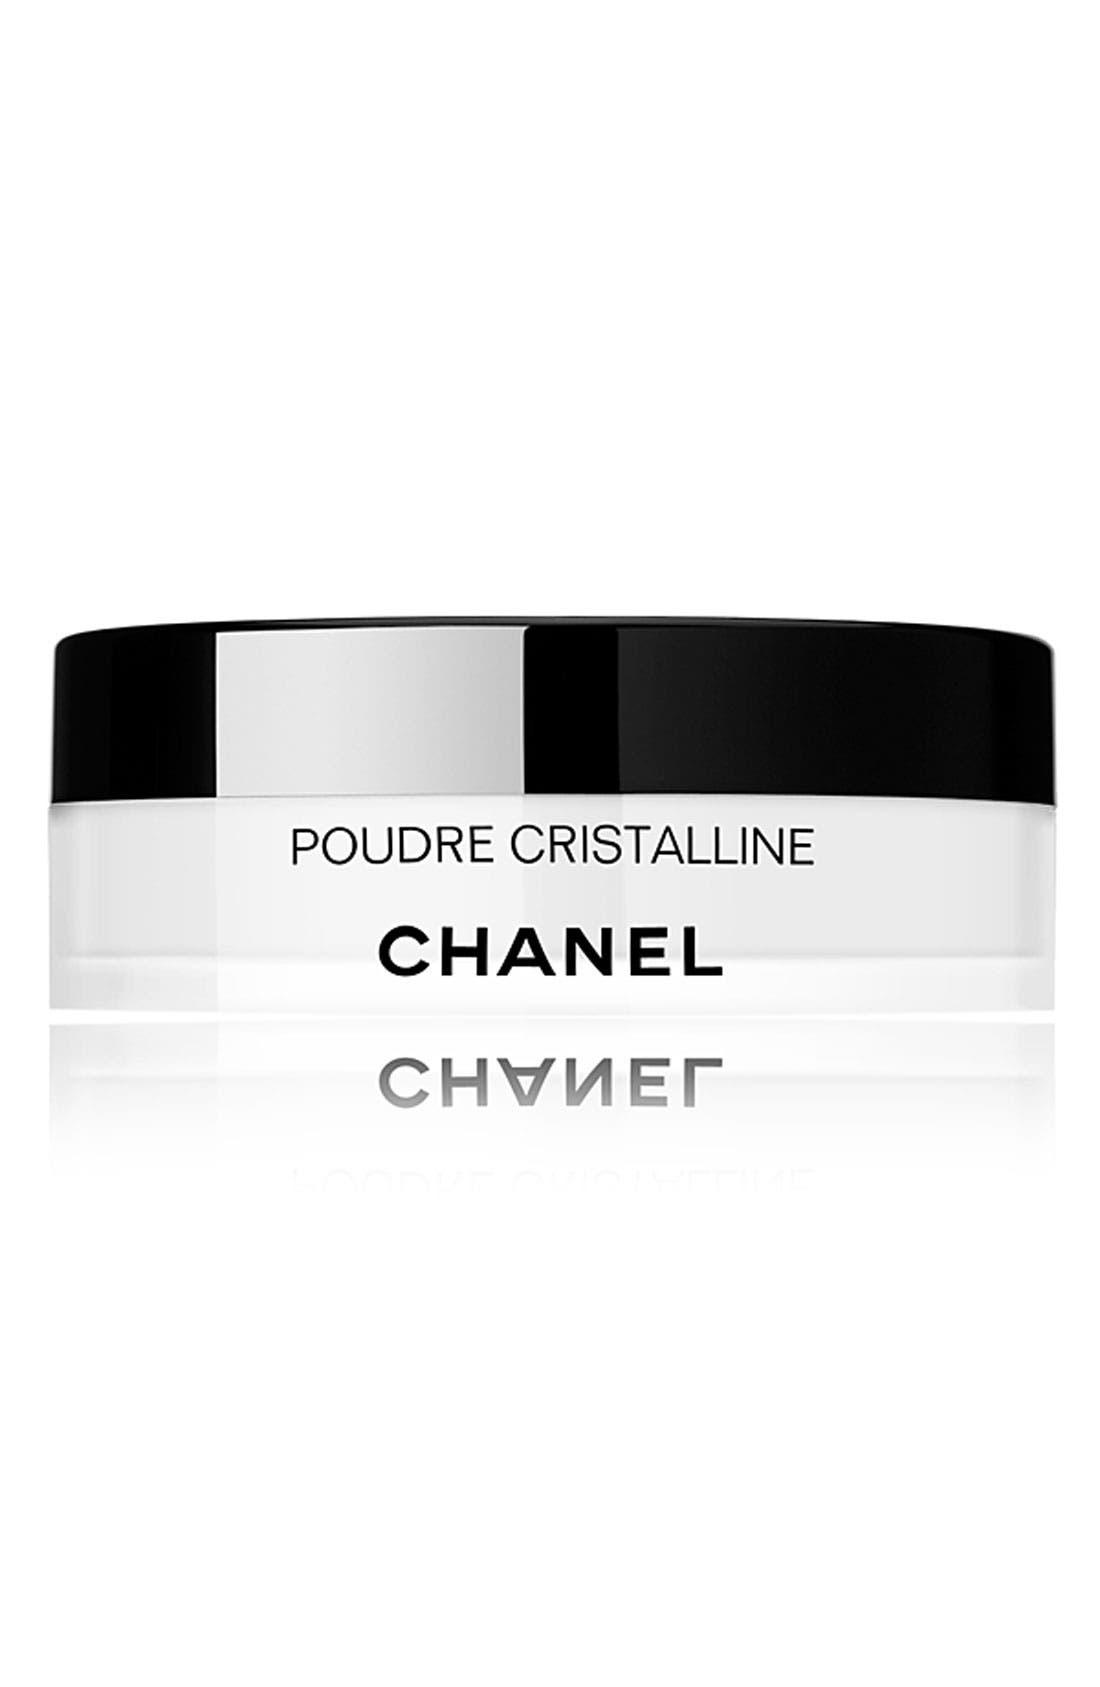 POUDRE CRISTALLINE Ultra-Fine Translucent Powder with Deluxe Puff, Main, color, 000